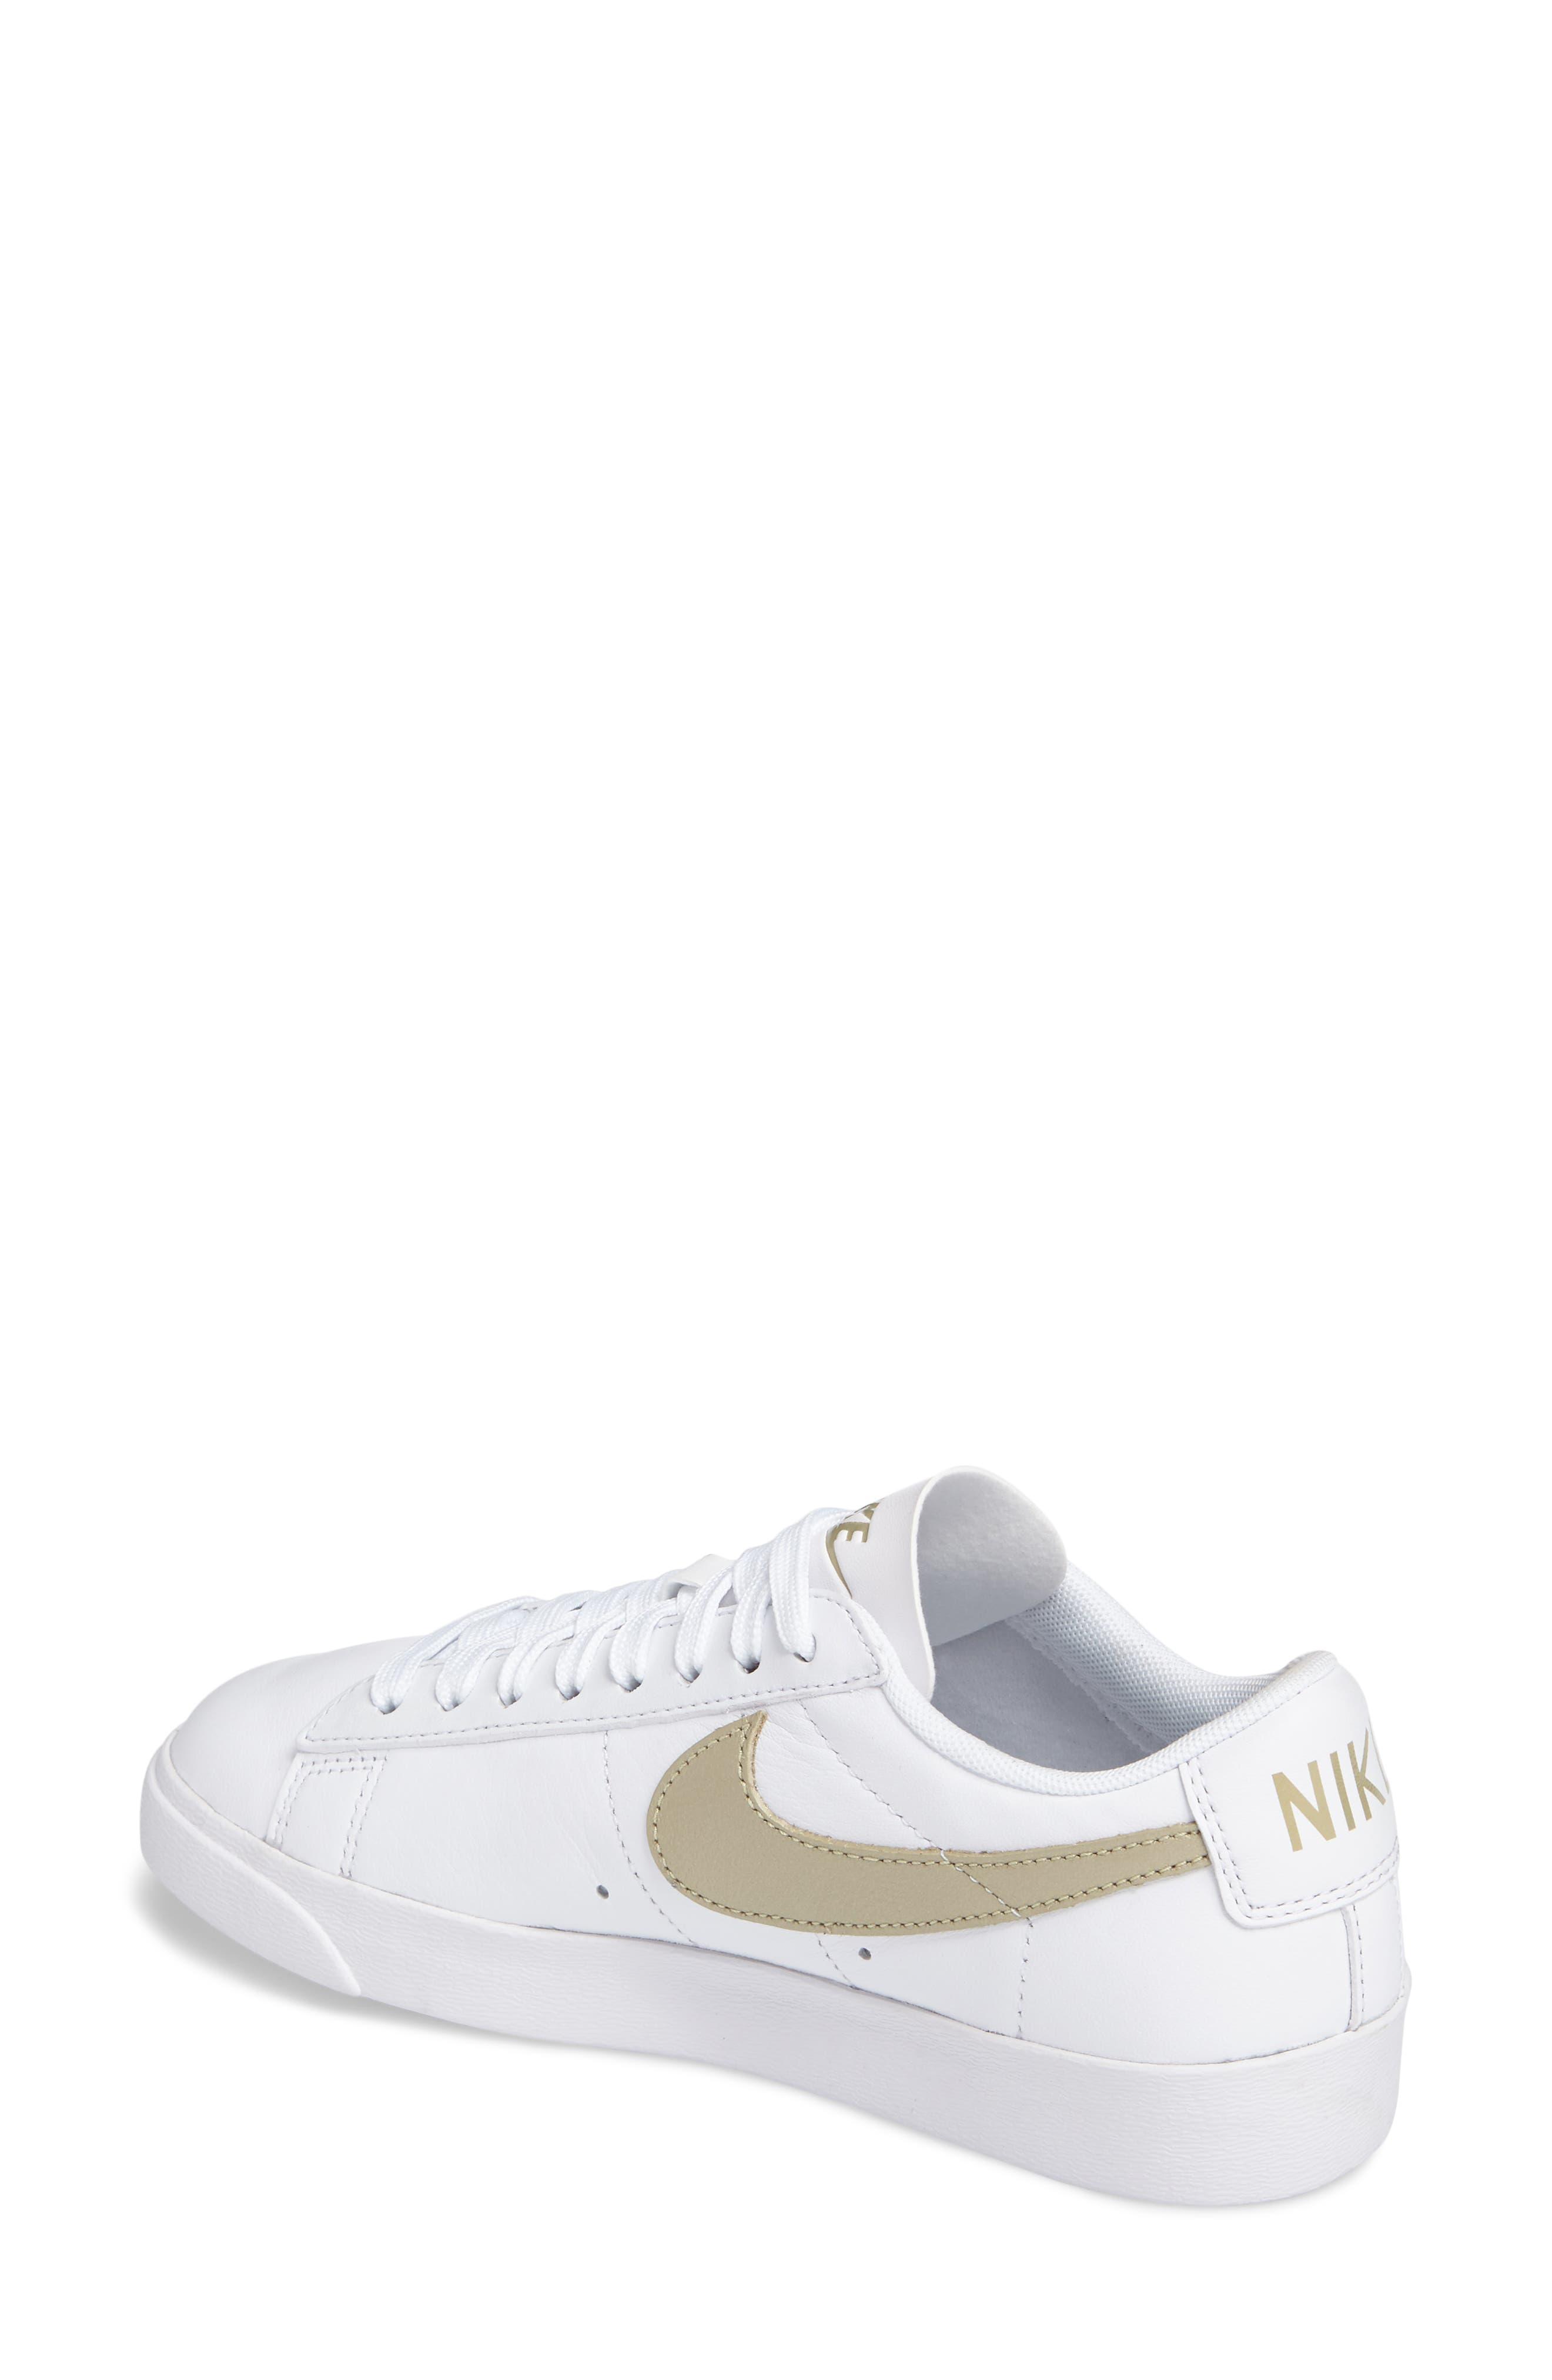 Alternate Image 3  - Nike Blazer Low LE Basketball Shoe (Women)